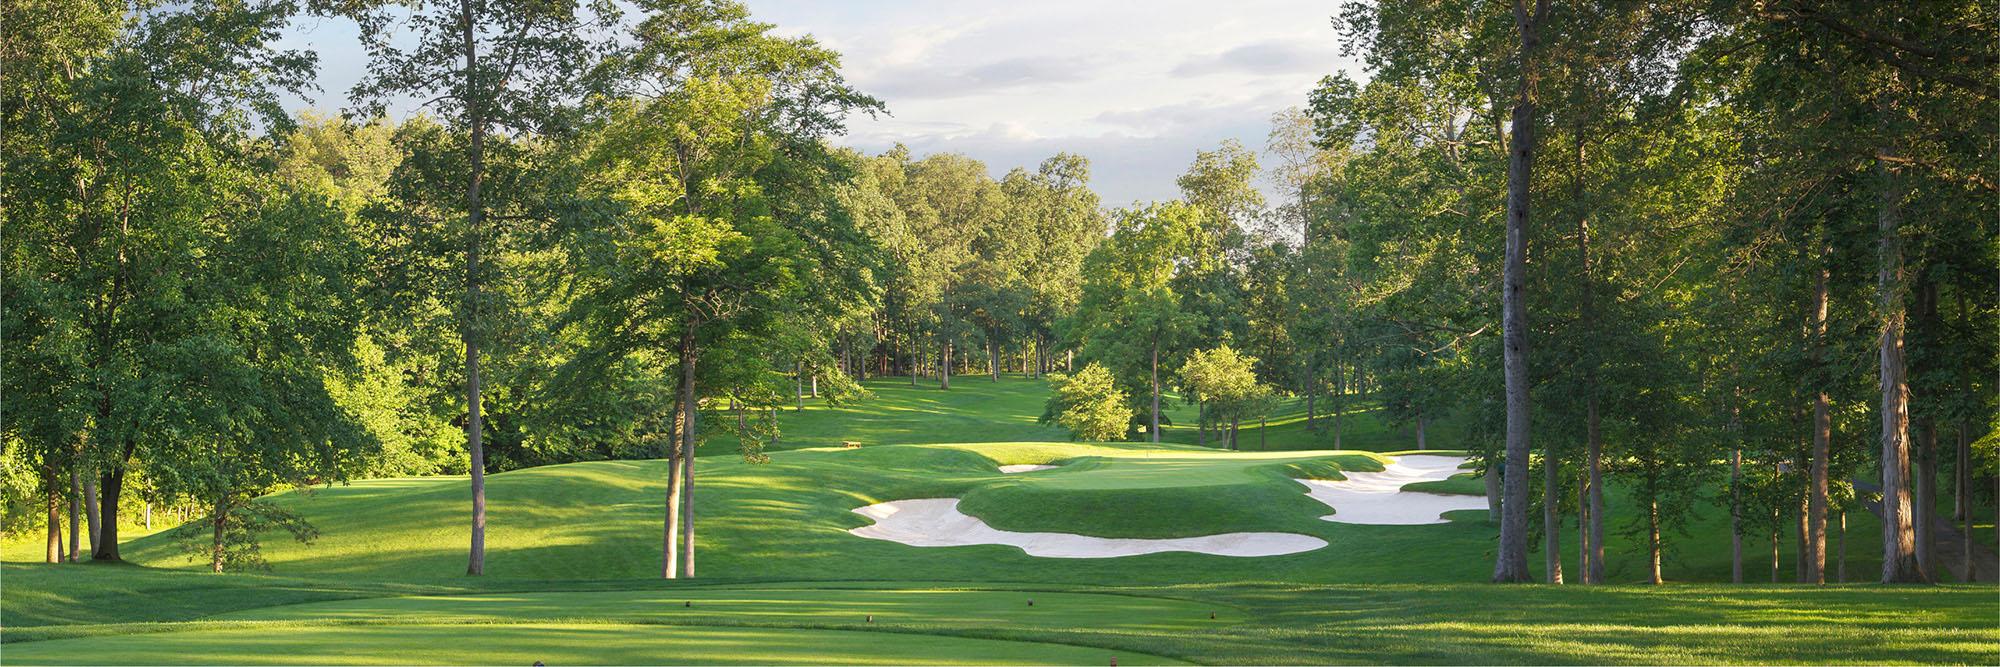 Golf Course Image - Muirfield Village No. 8